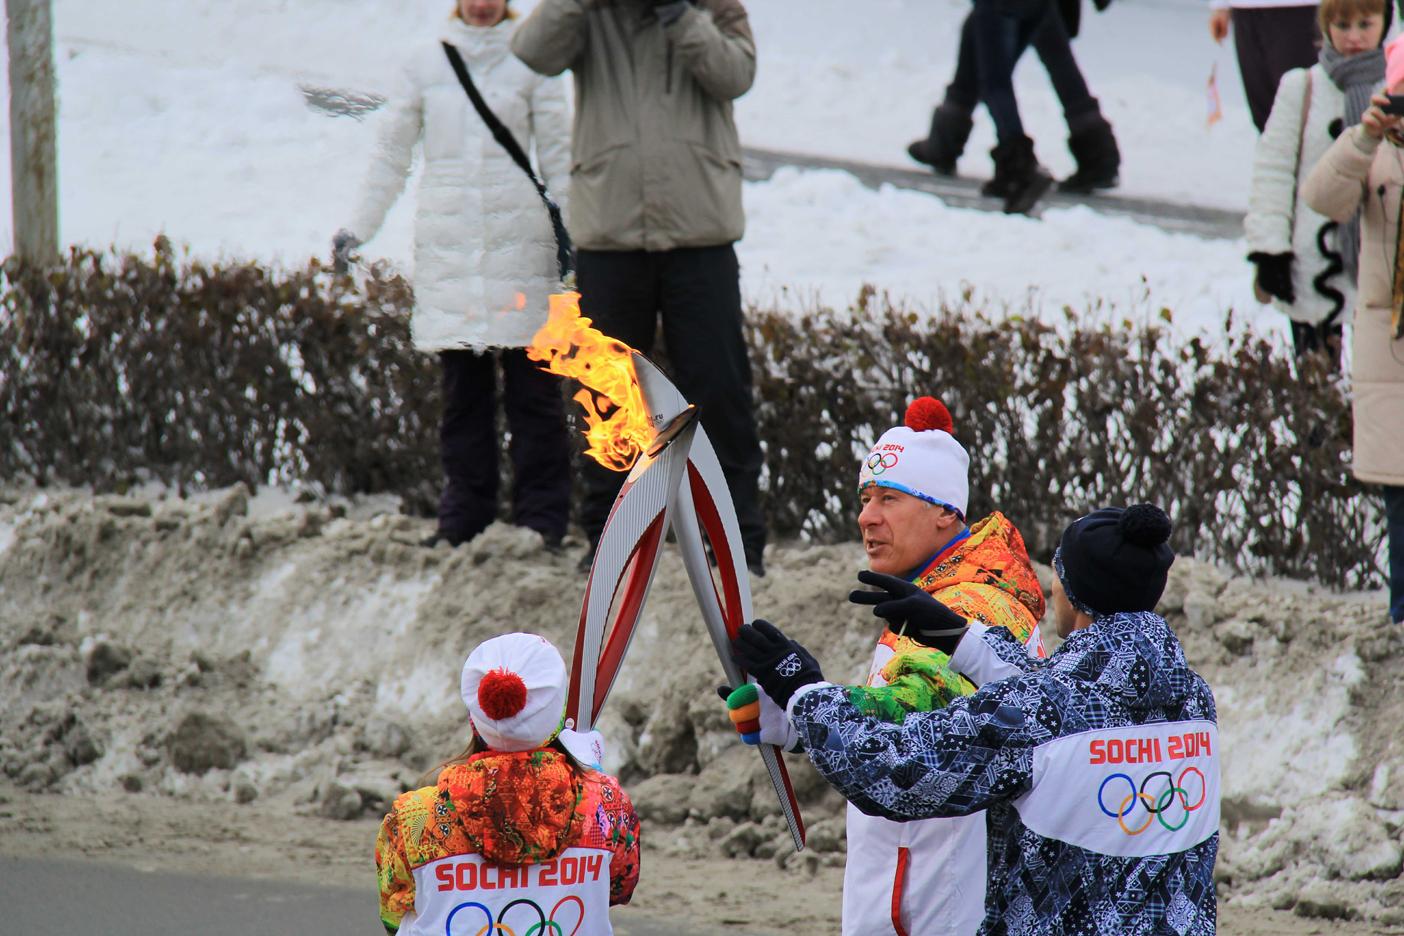 Передача эстафеты олимпийского огня4